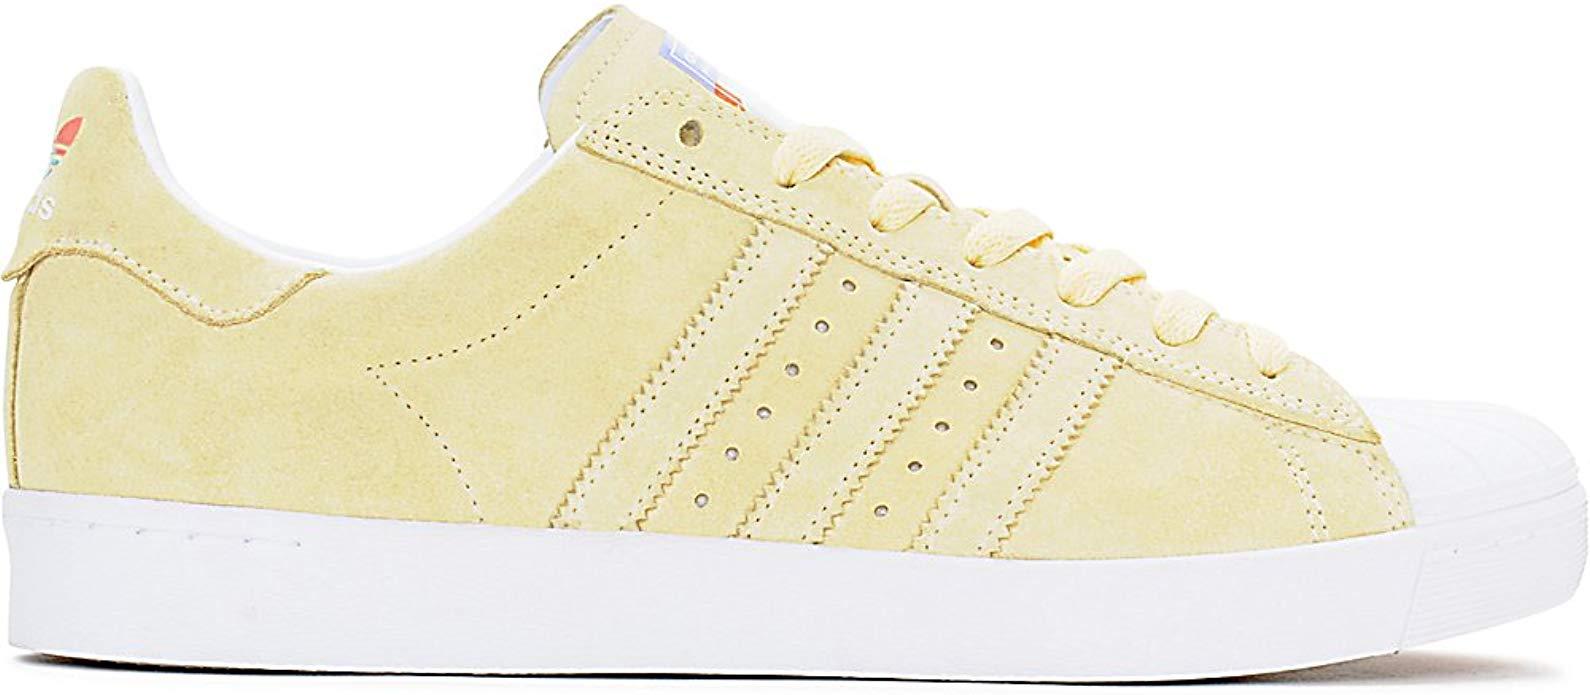 adidas Superstar Vulc Adv Pastel Yellow